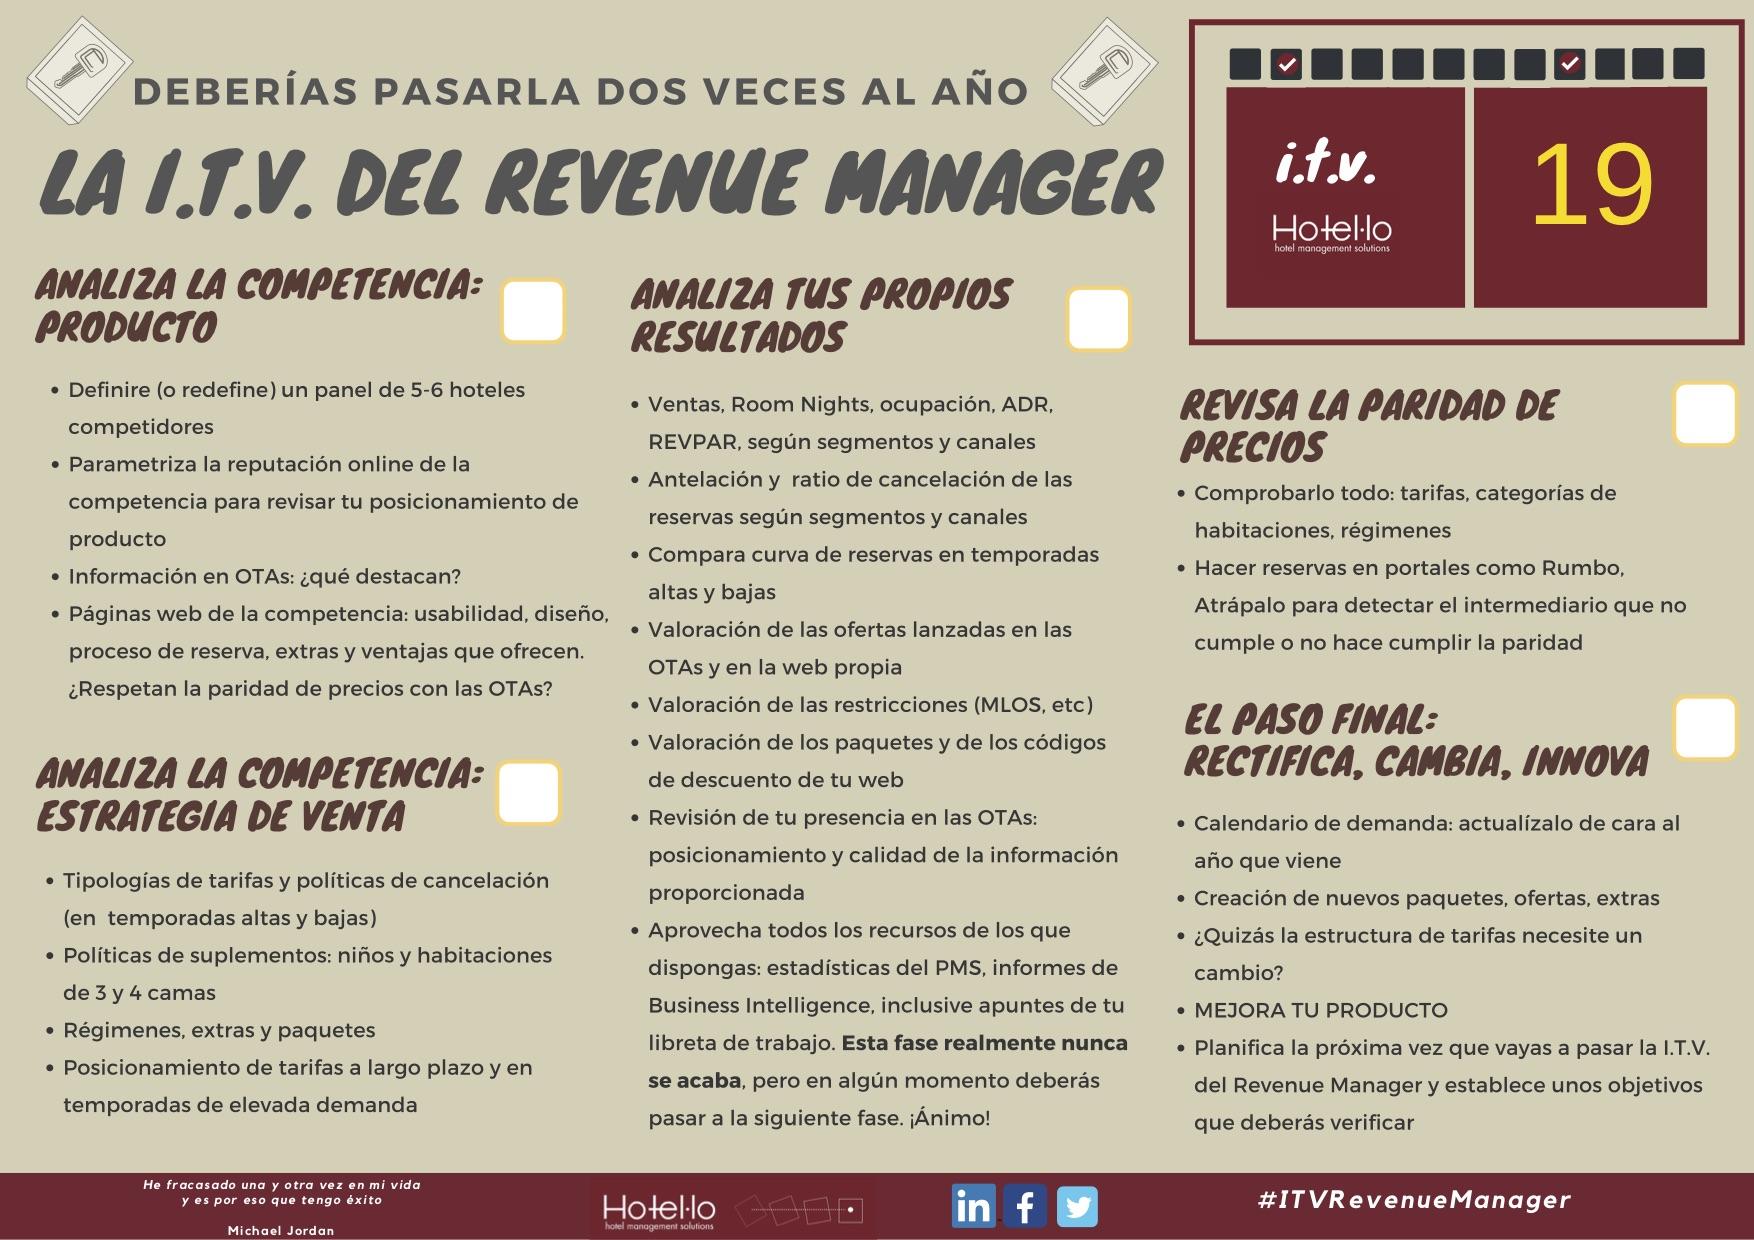 Calendario Atrapalo.La Itv Del Revenue Manger Infografia Infographic Turismo Tics Y